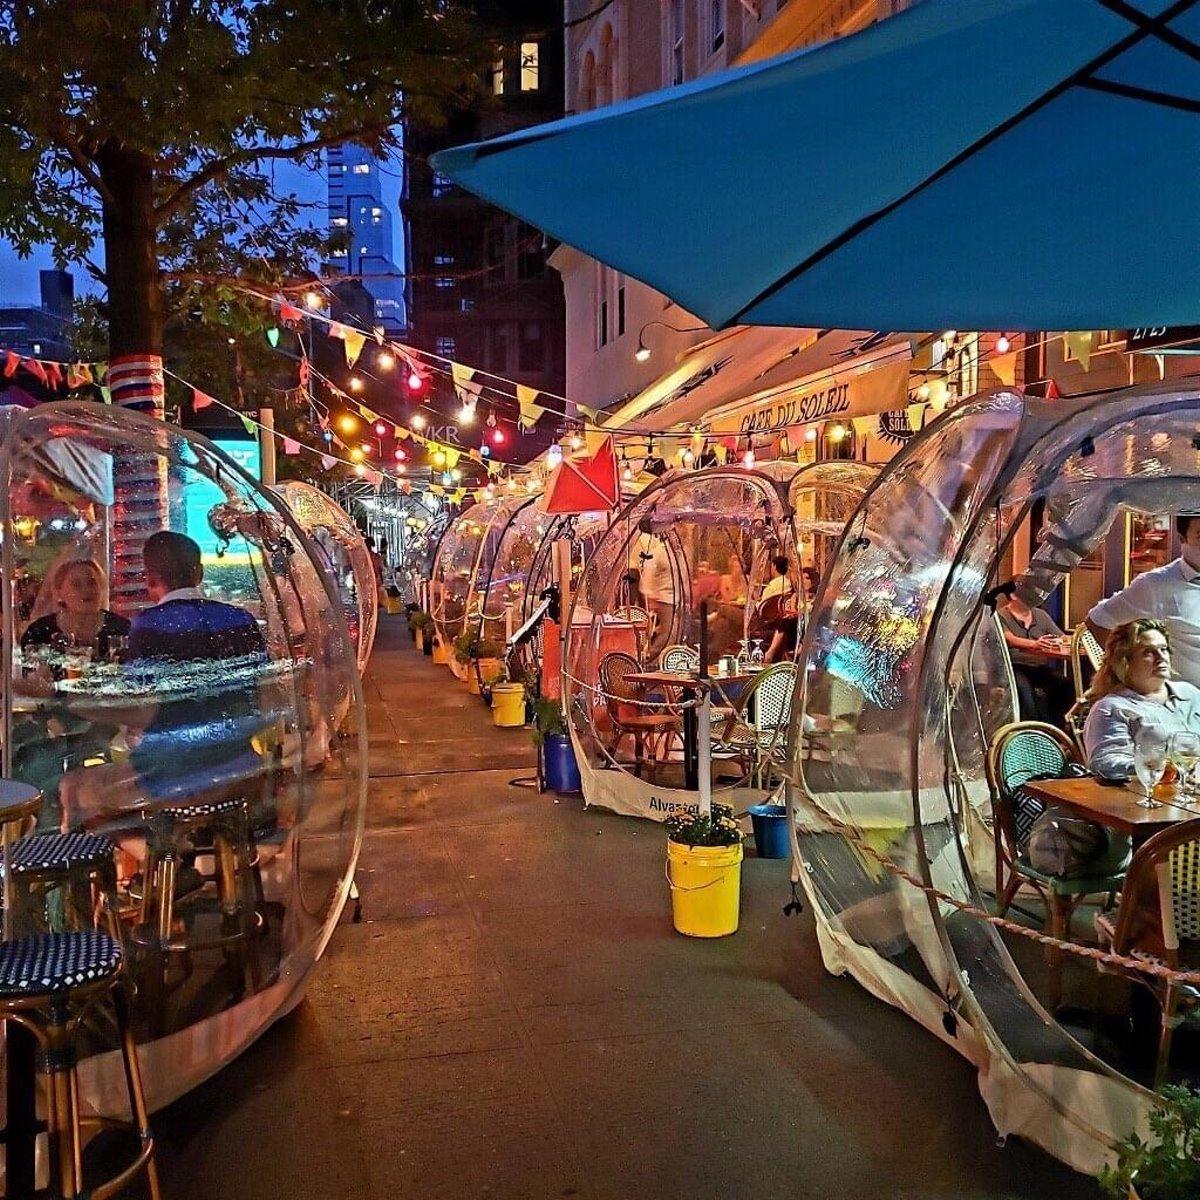 Cafe du Soleil εστιατόρια τον χειμώνα μέσα σε φούσκες το βράδυ